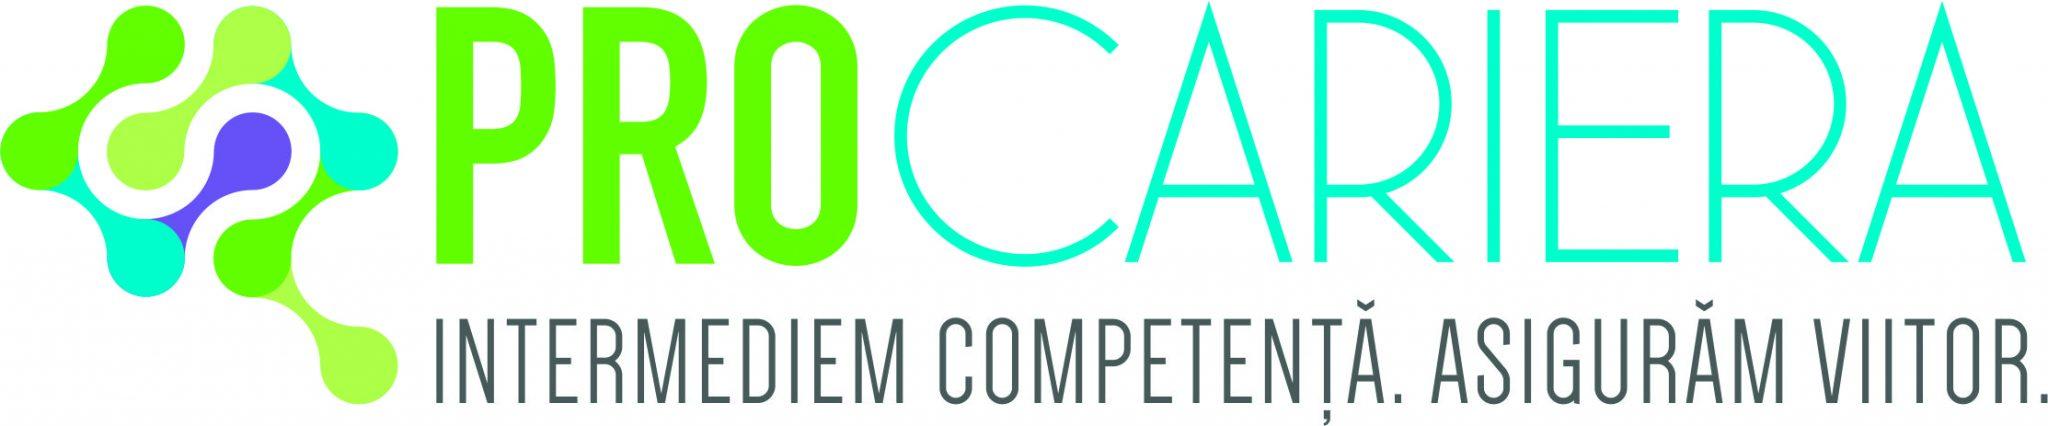 PROCARIERA-Logo_Ruma_nisch